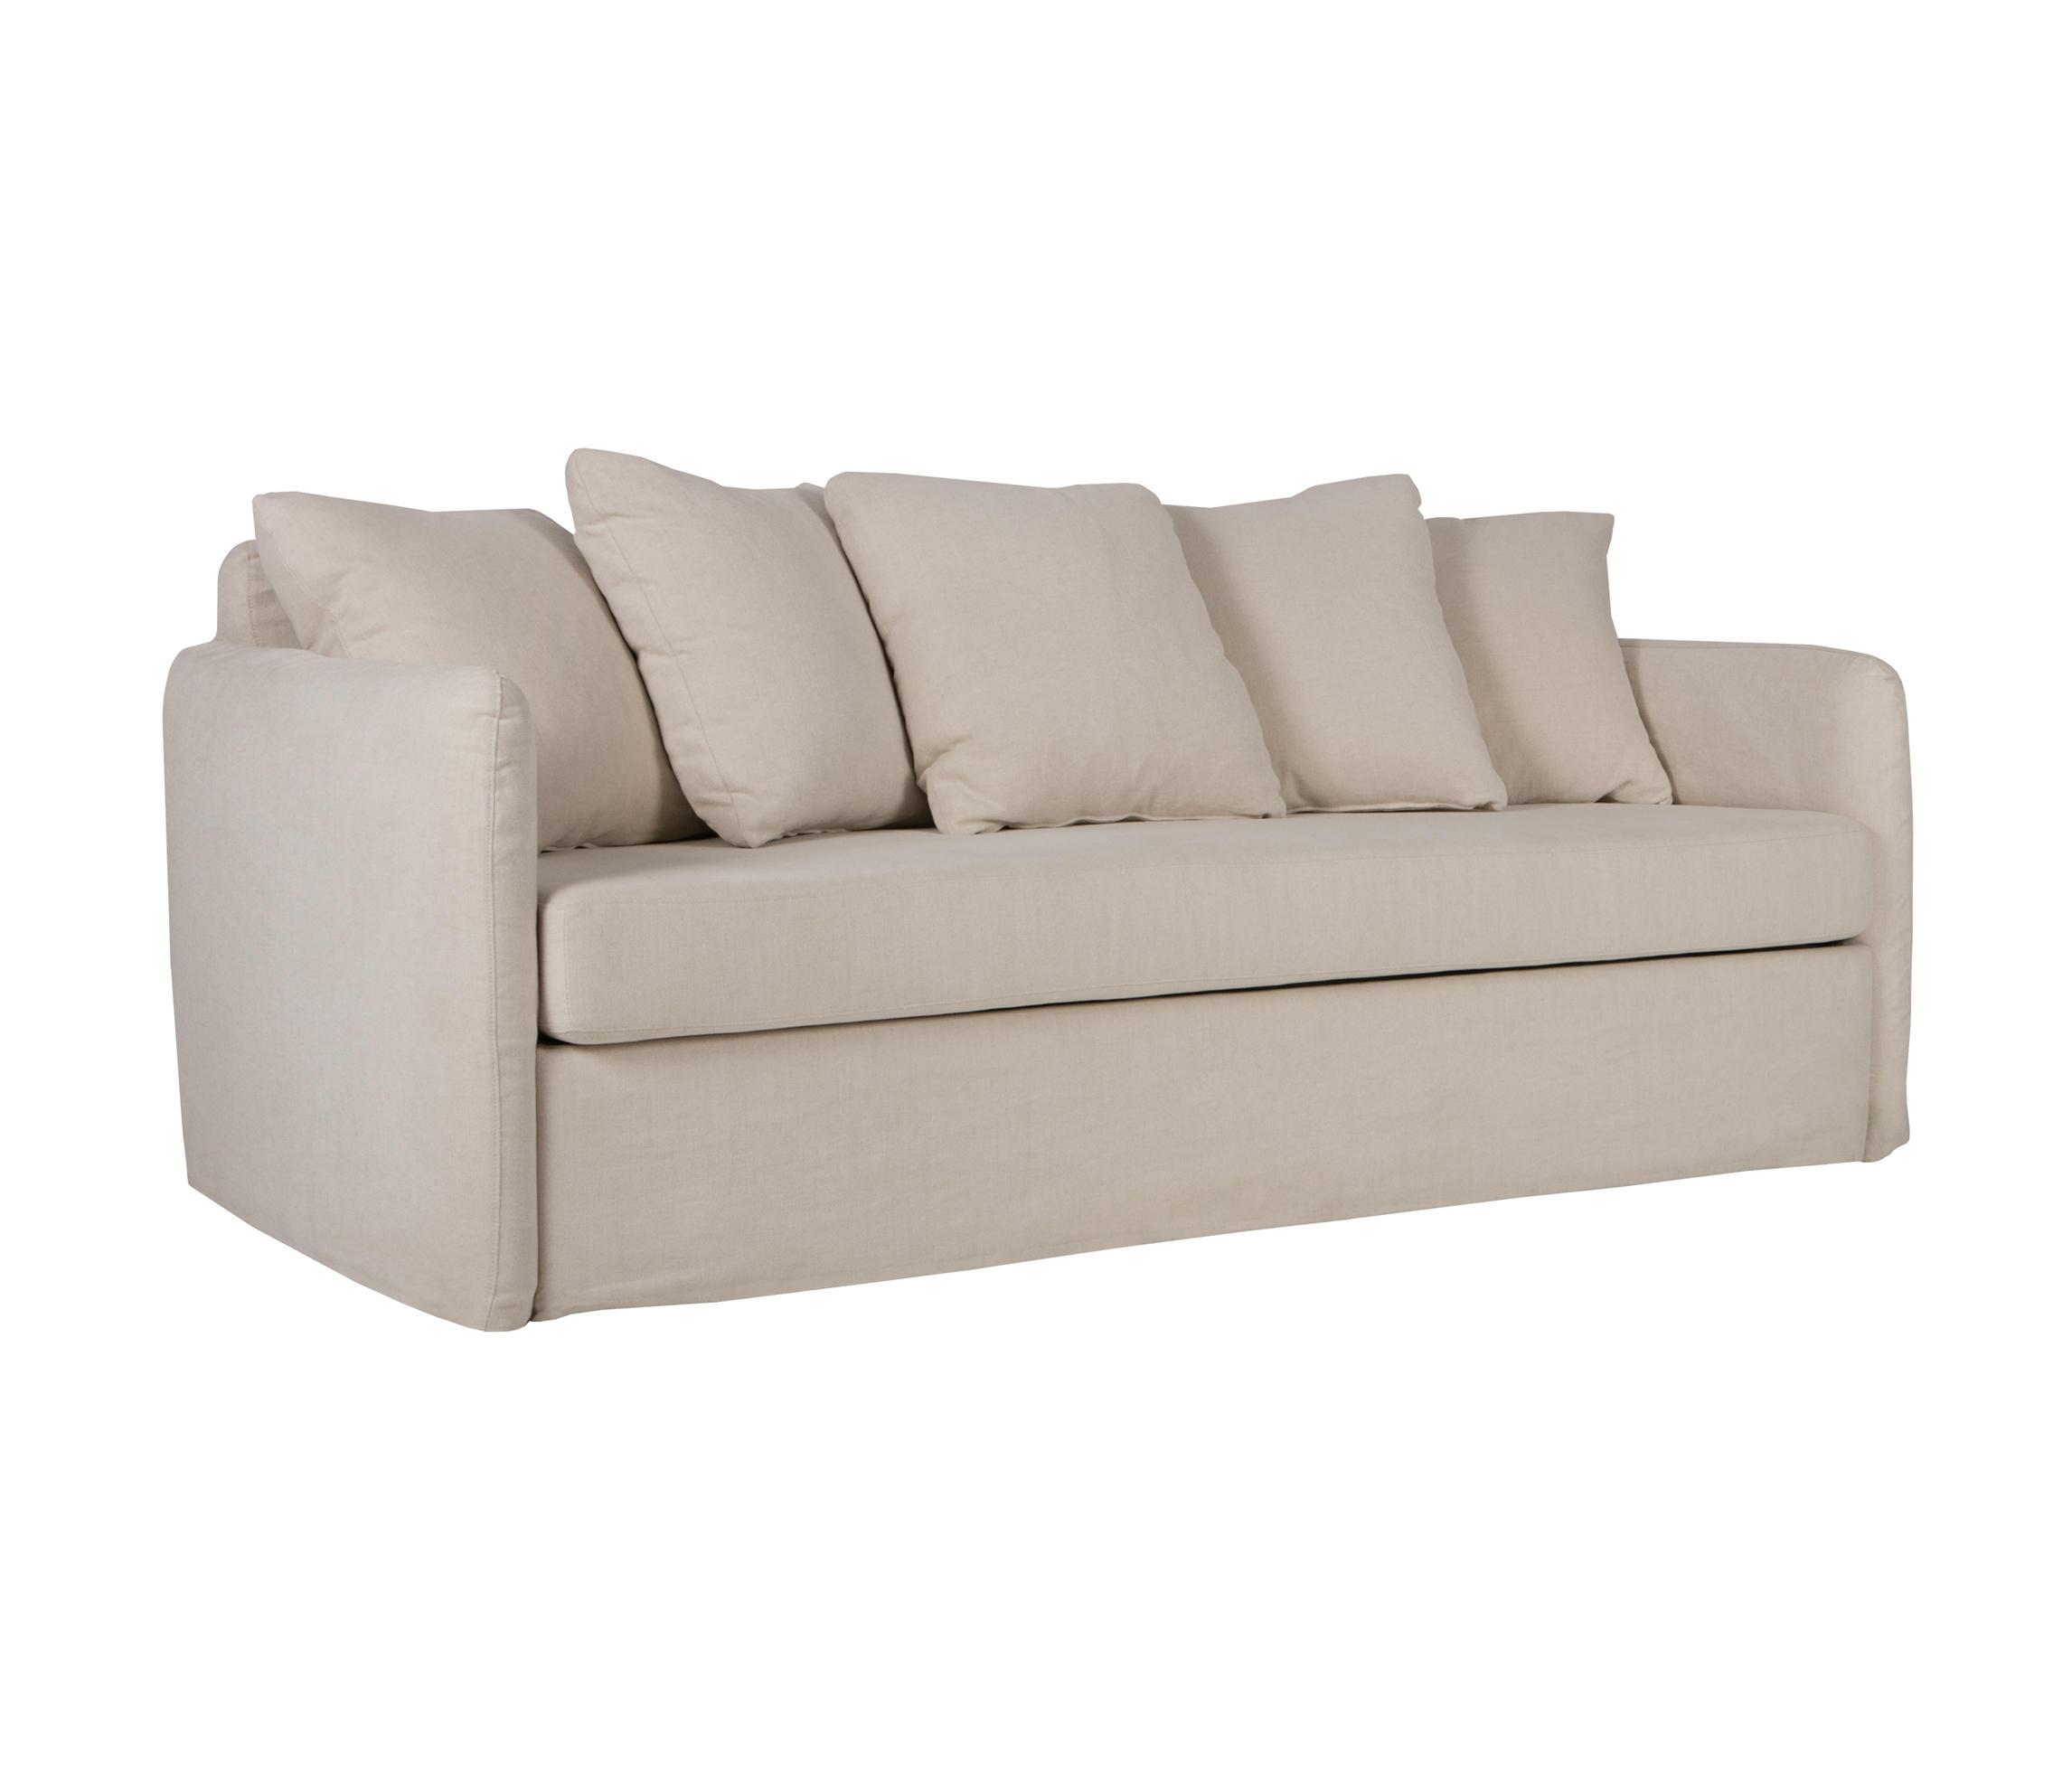 lotta sofas von sits architonic. Black Bedroom Furniture Sets. Home Design Ideas